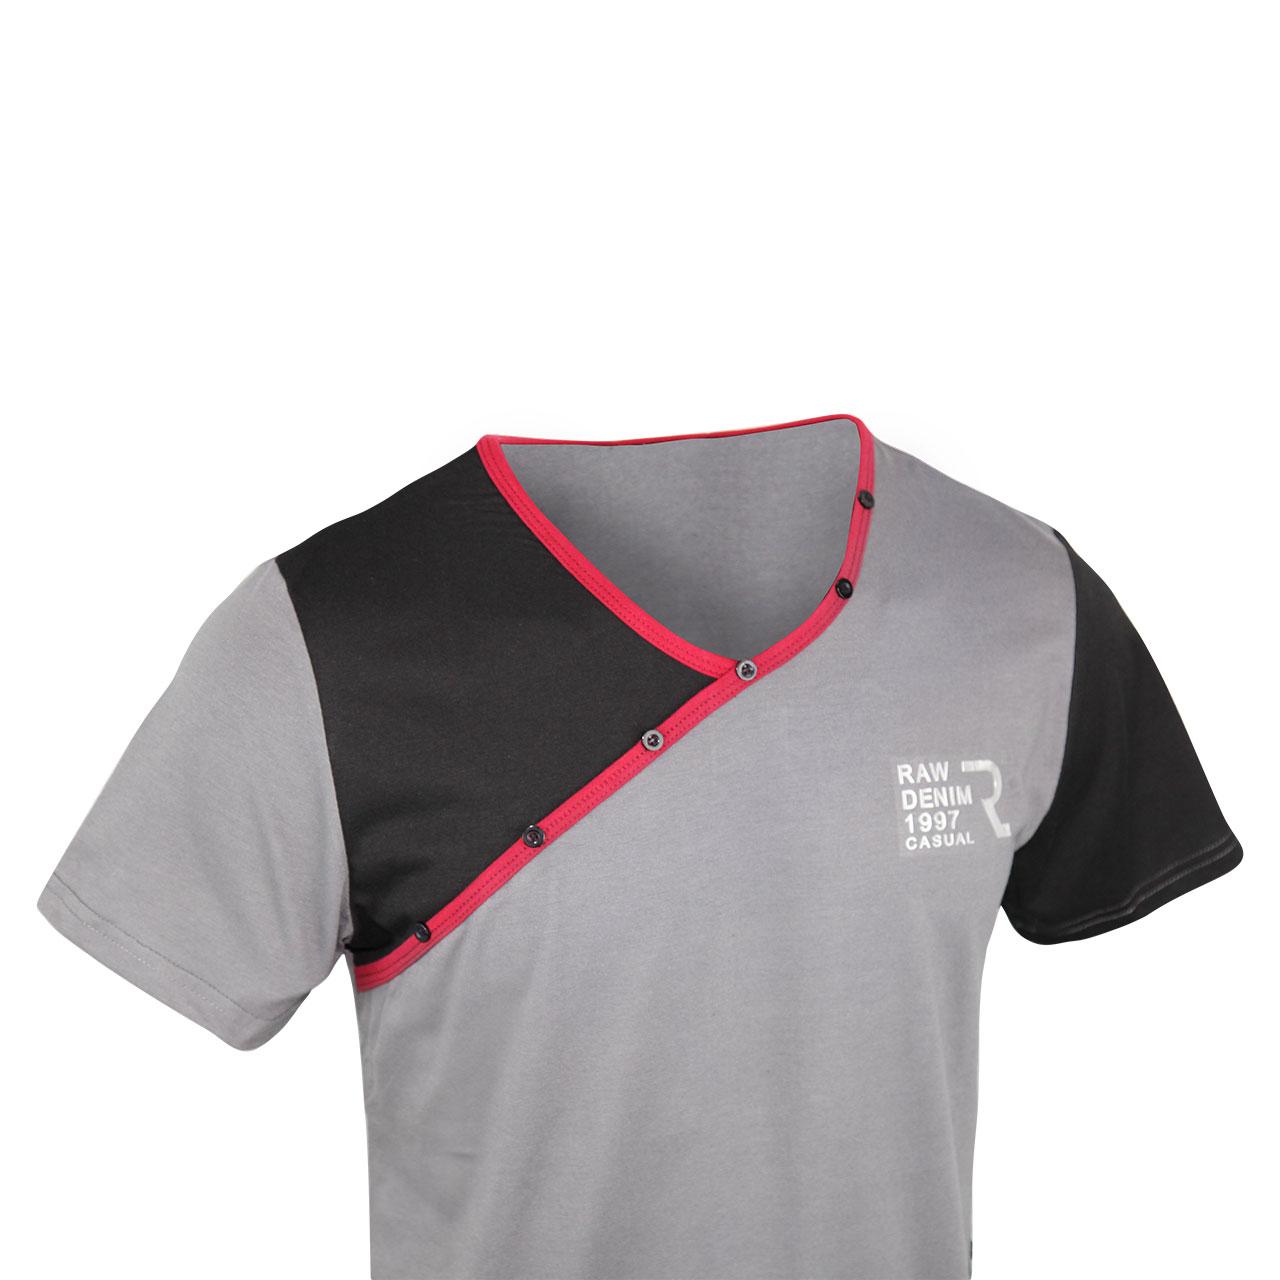 Men's Raw Denim 1997 Casual Logo Printed Short Sleeve V-Neck Shirt - Black/Ash/Maroon